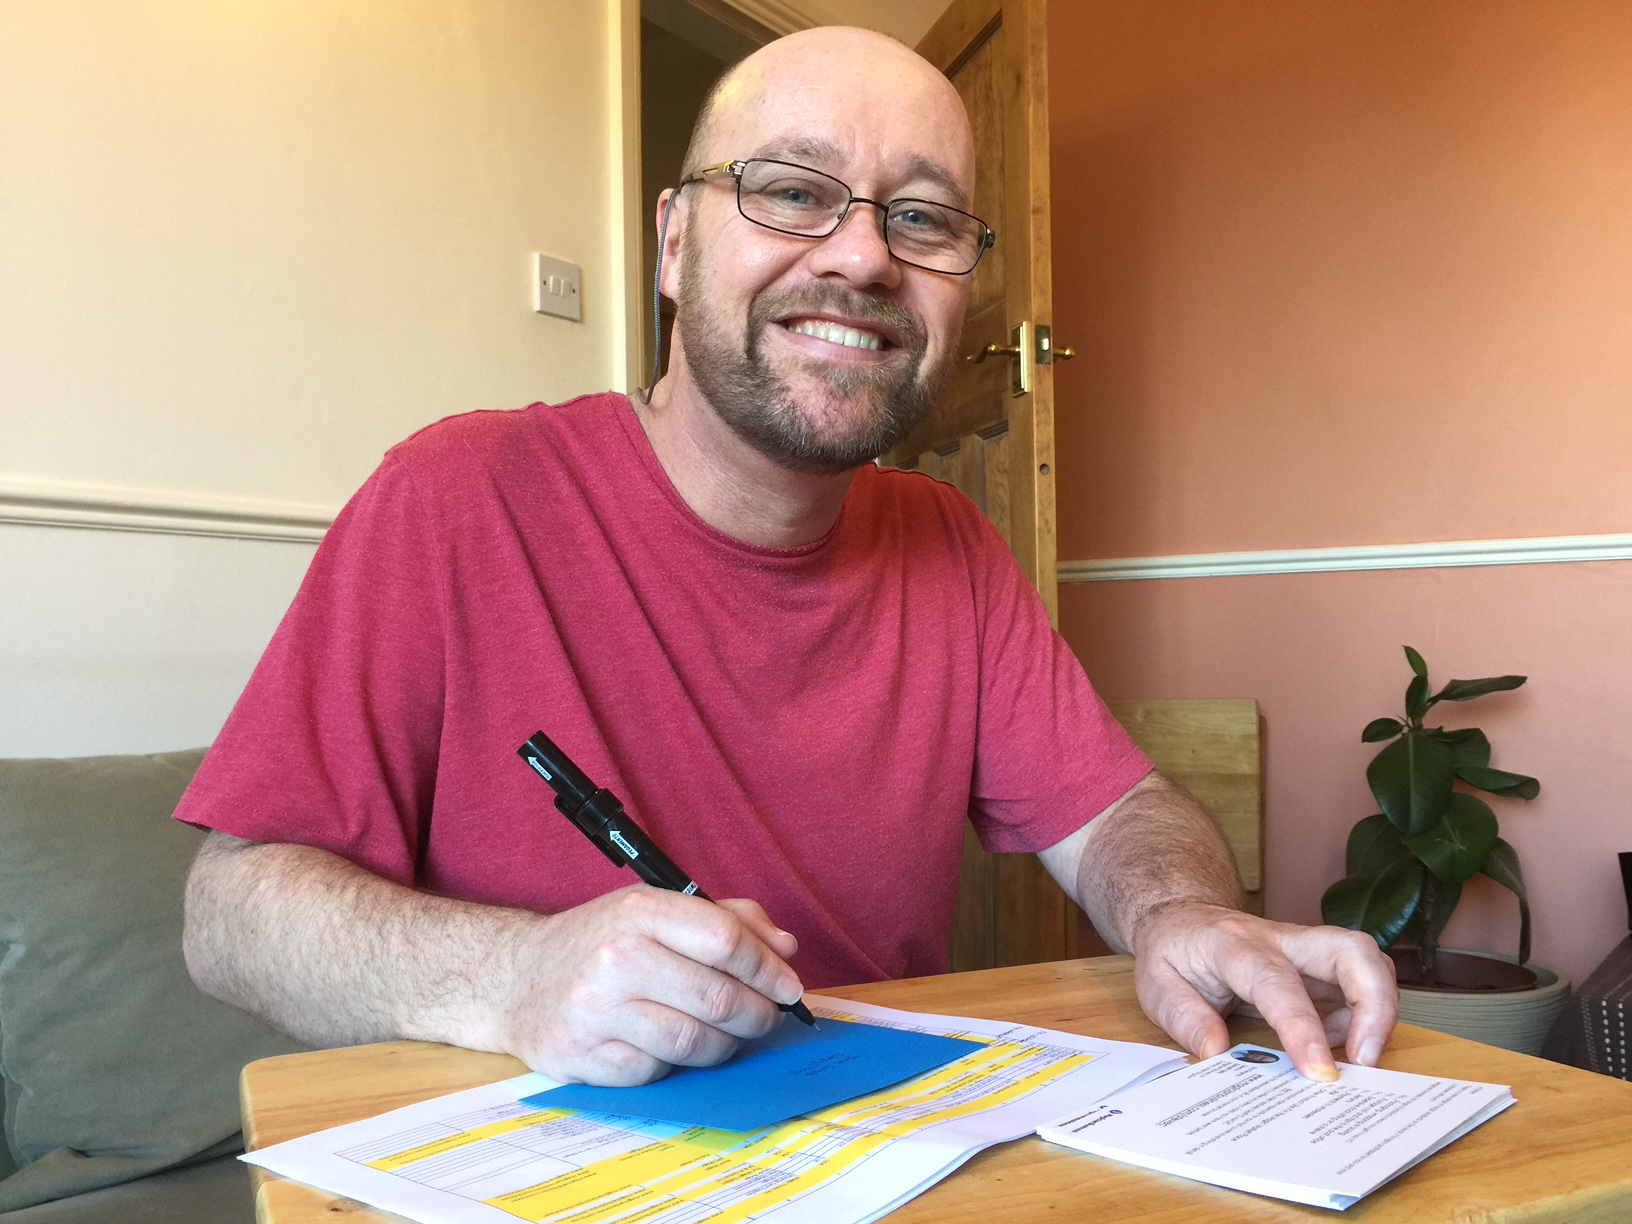 Ken Kelly hand-writing letter envelopes for prospective affiliates